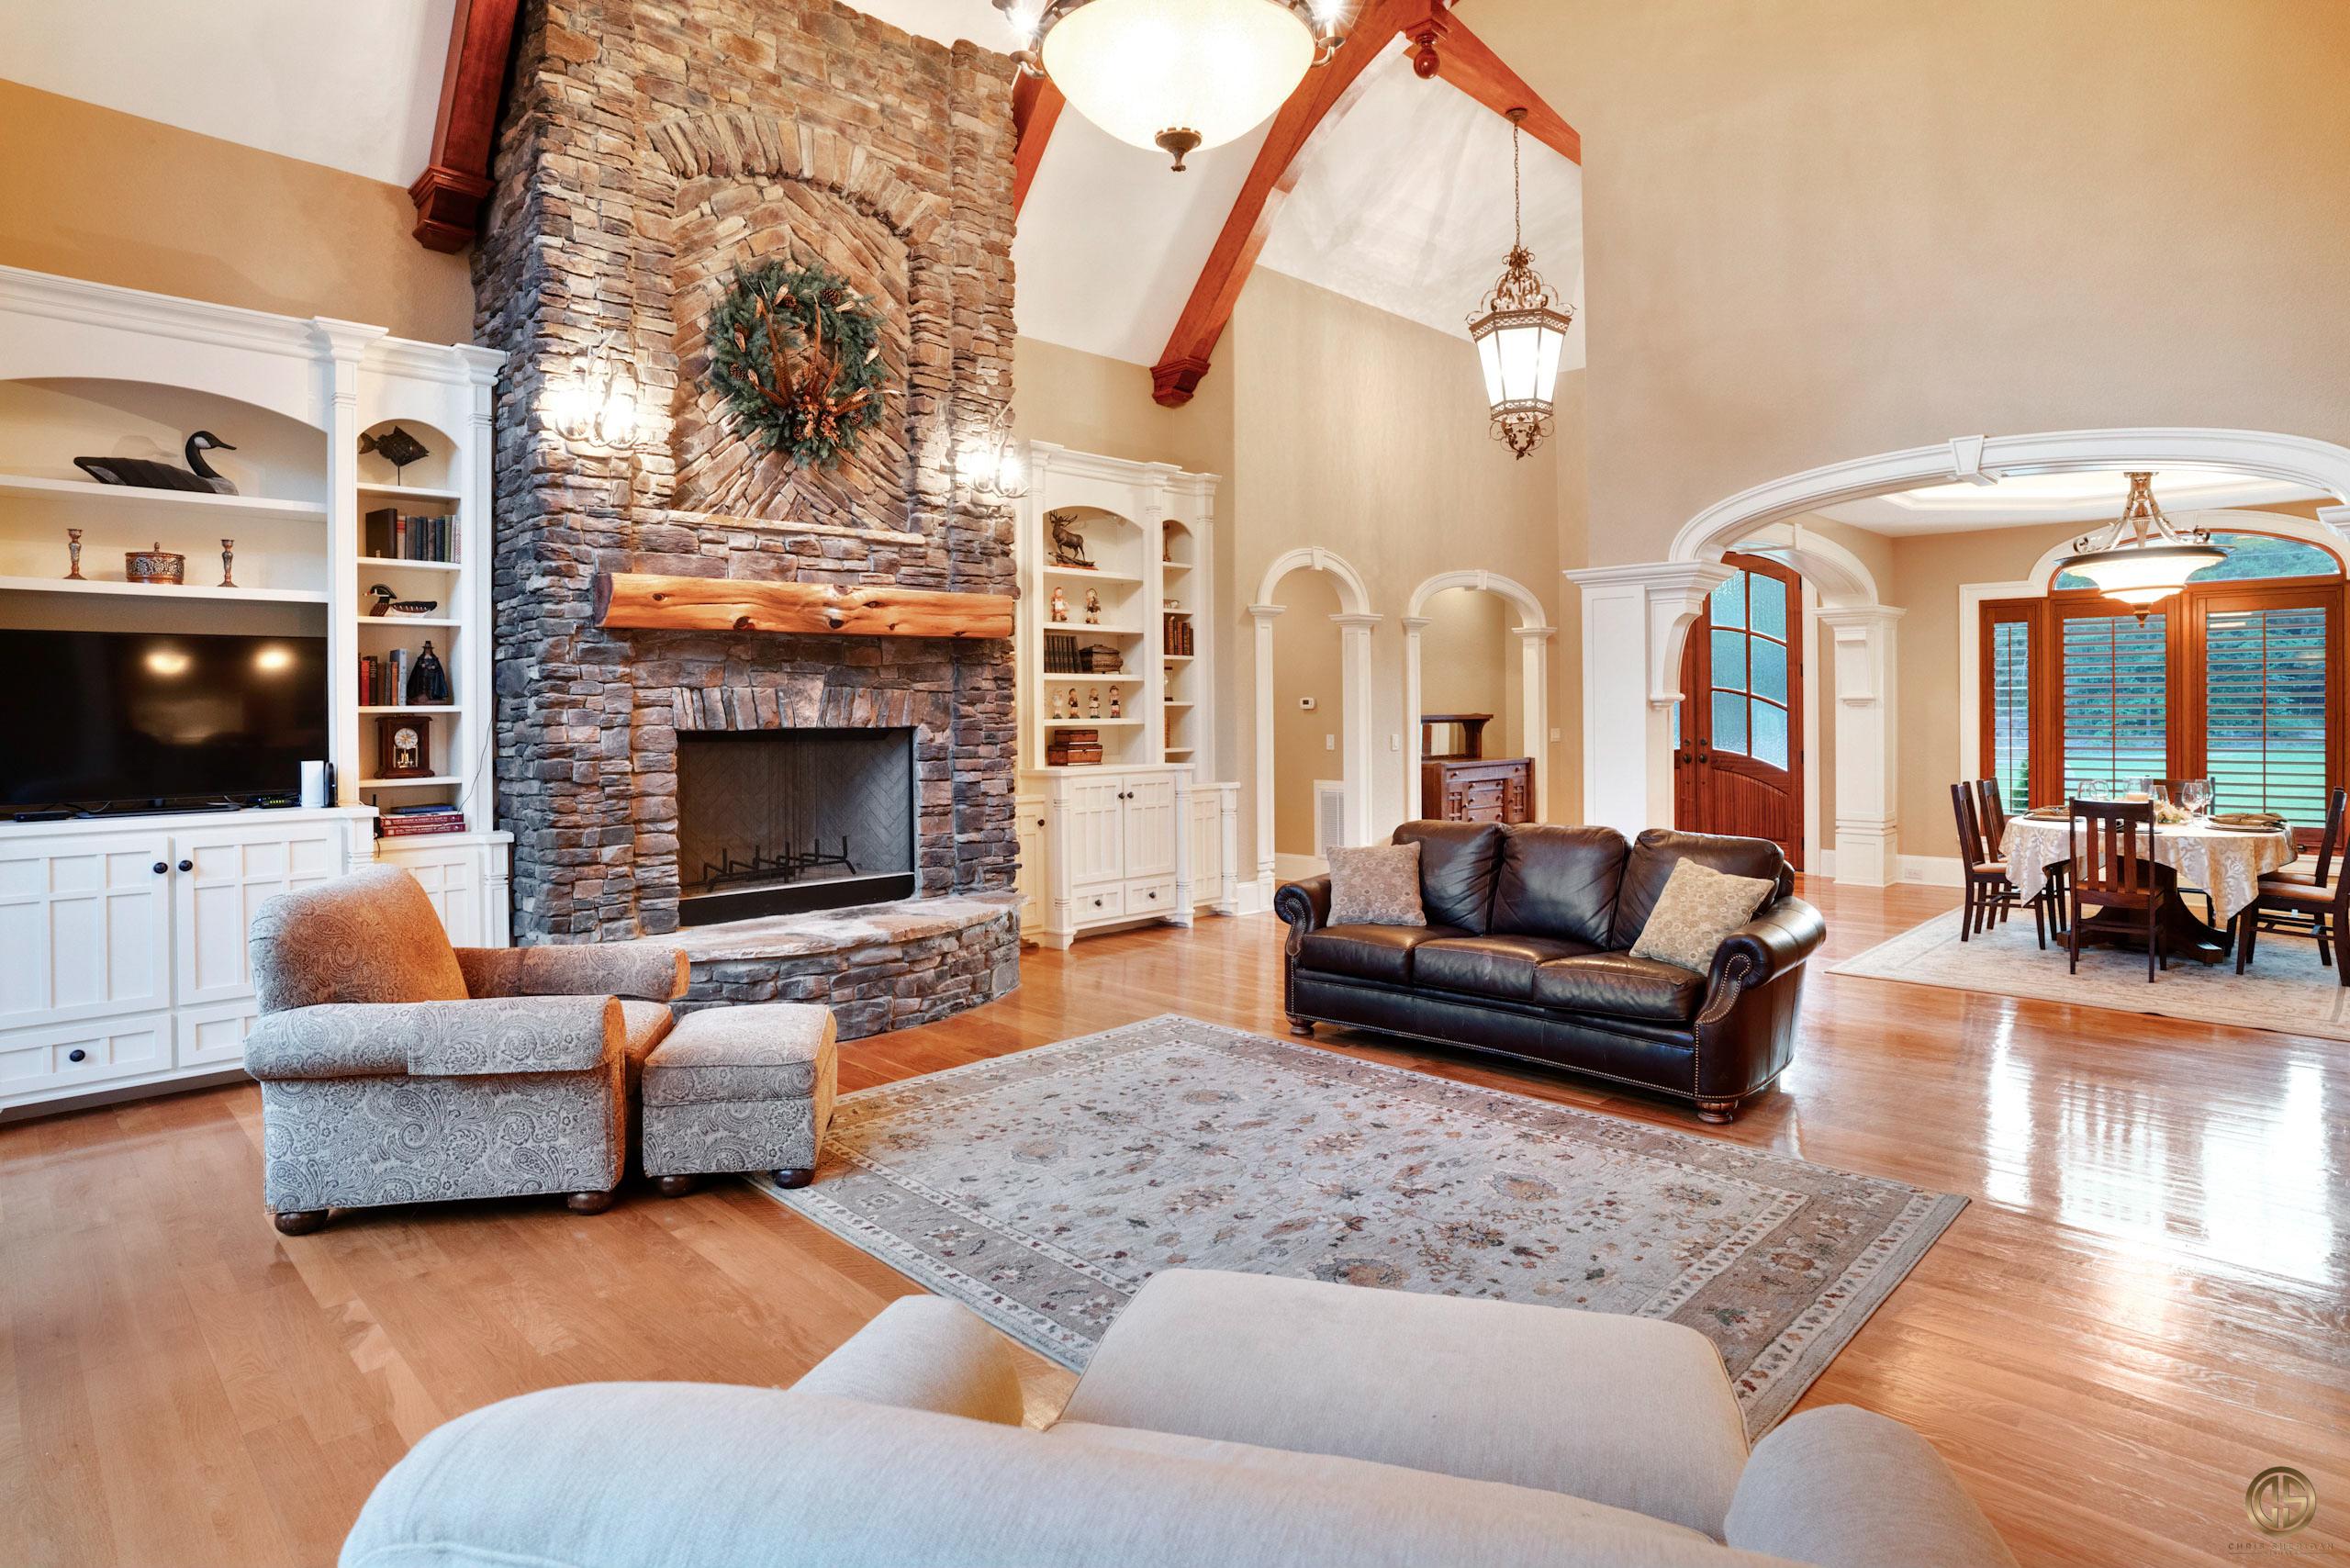 Beautifully captured interior photo